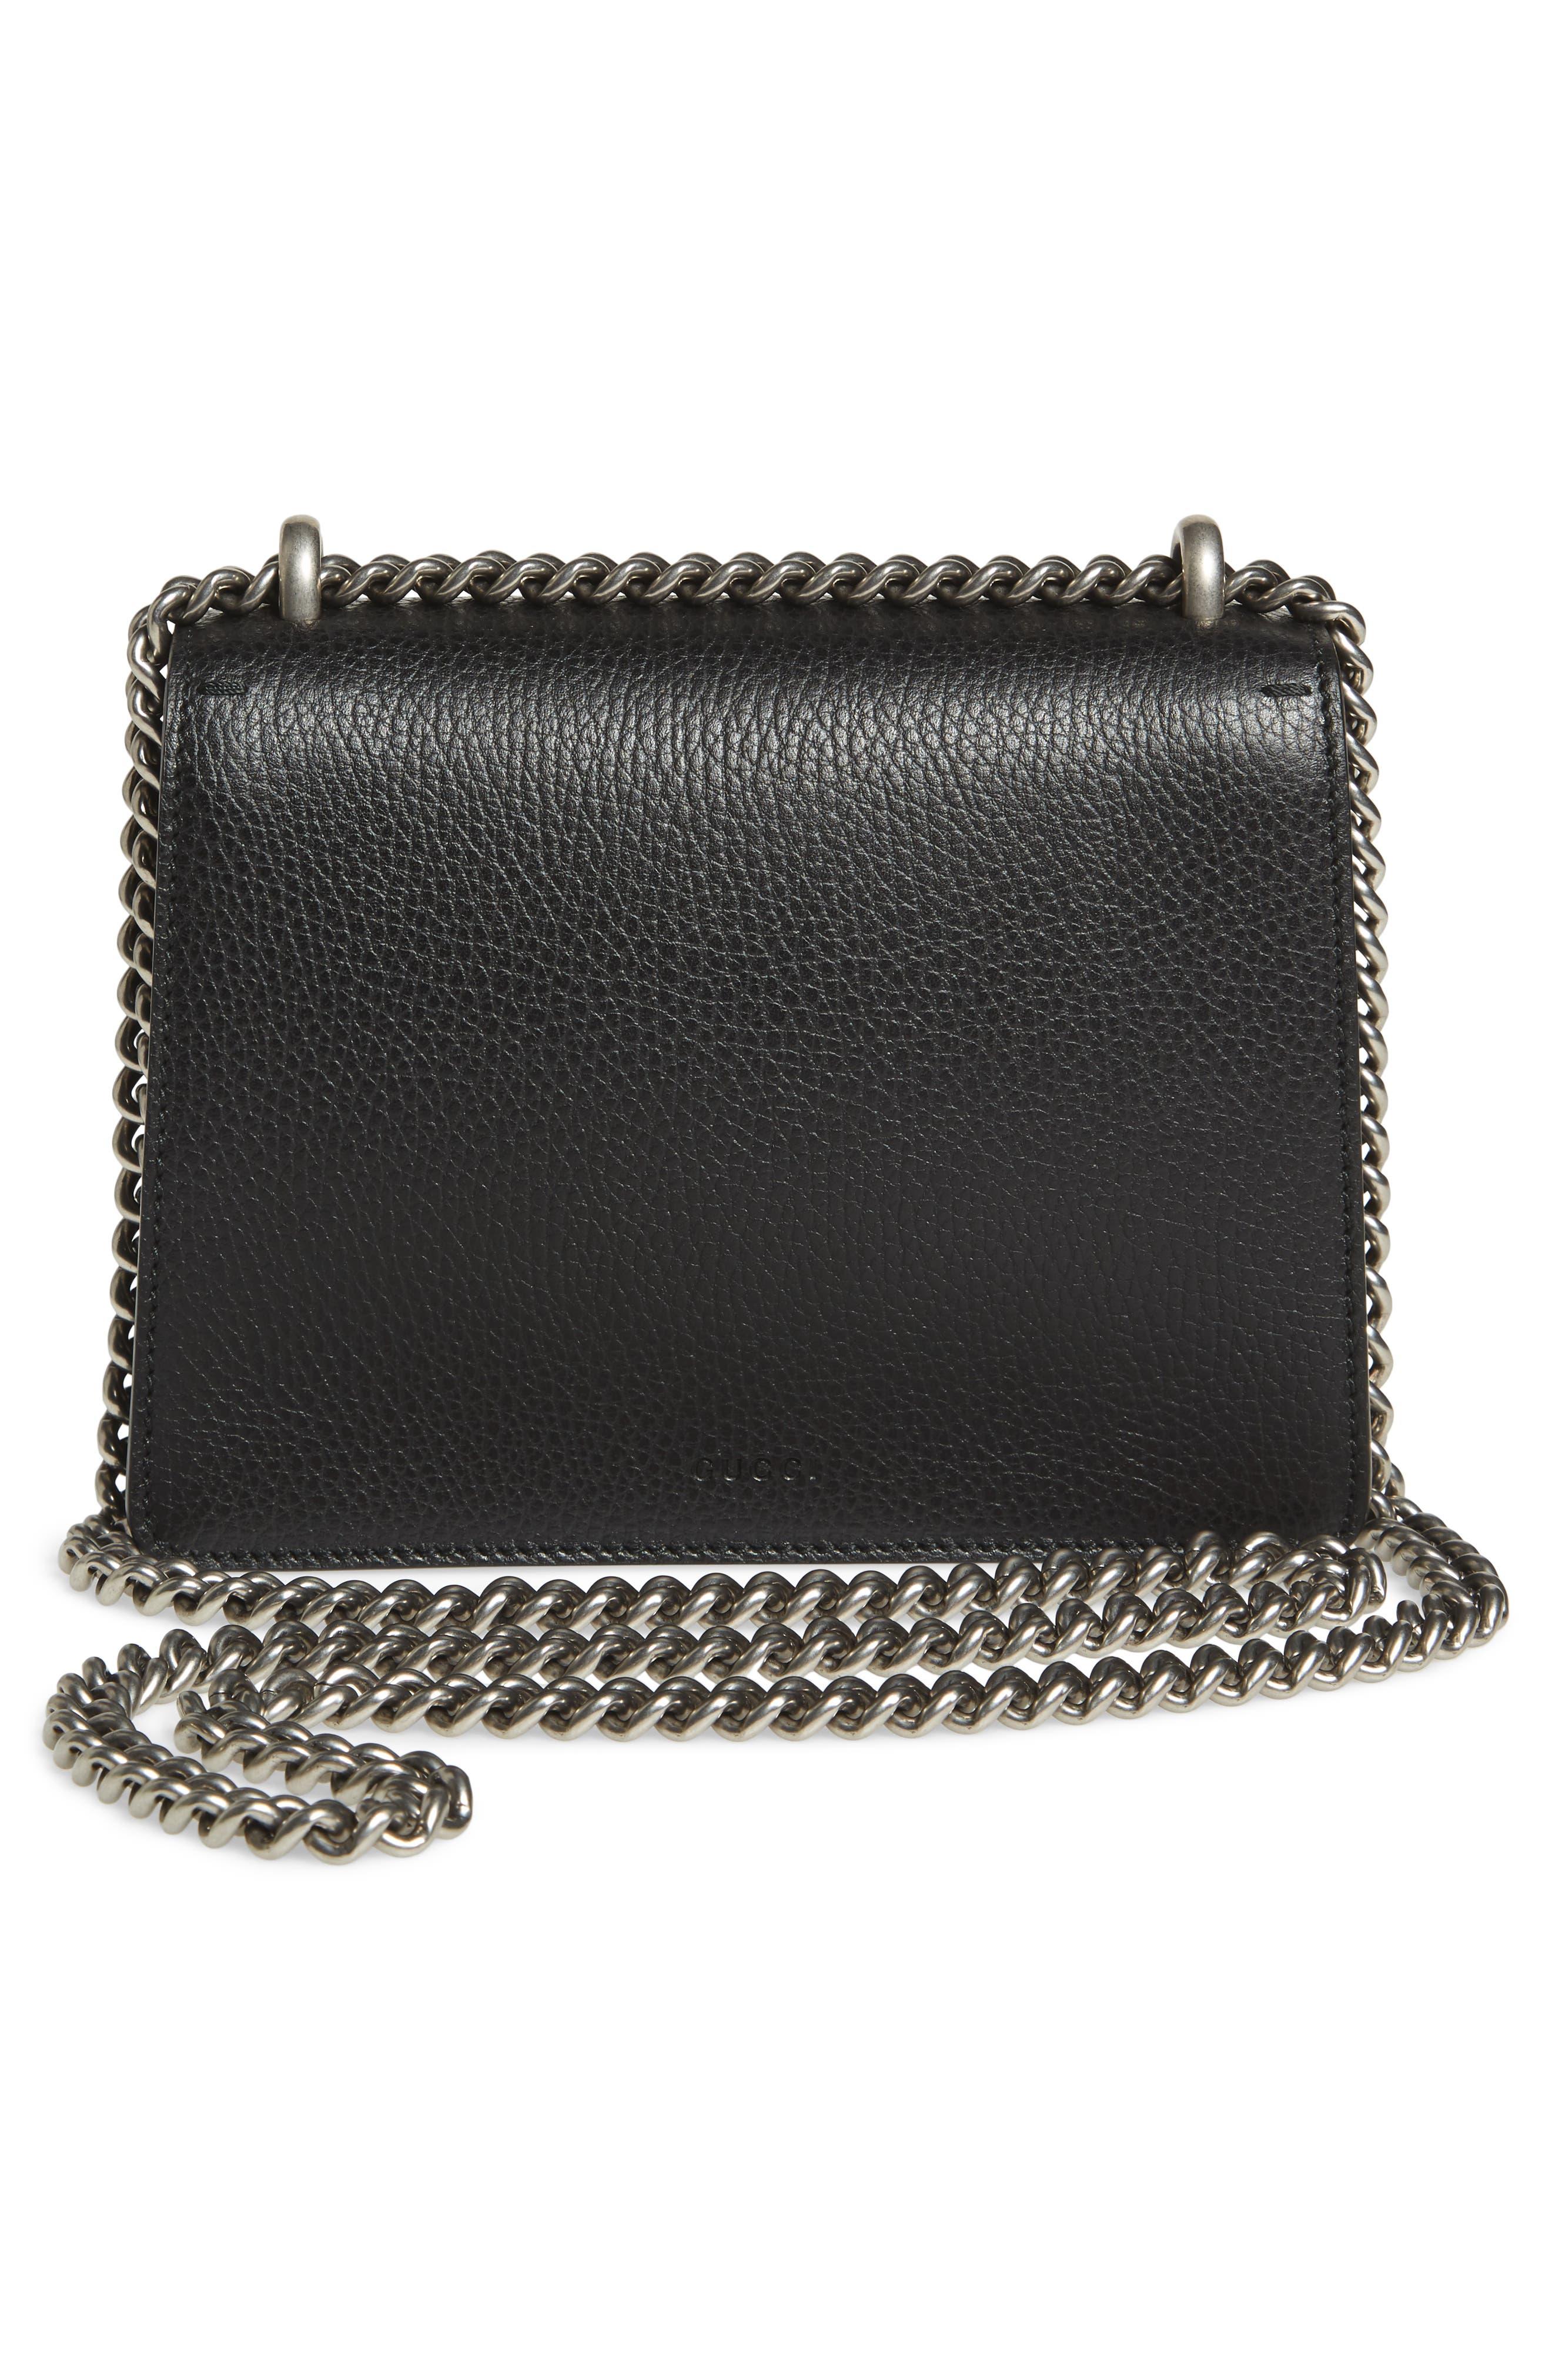 Alternate Image 3  - Gucci Mini Dionysus Leather Shoulder Bag